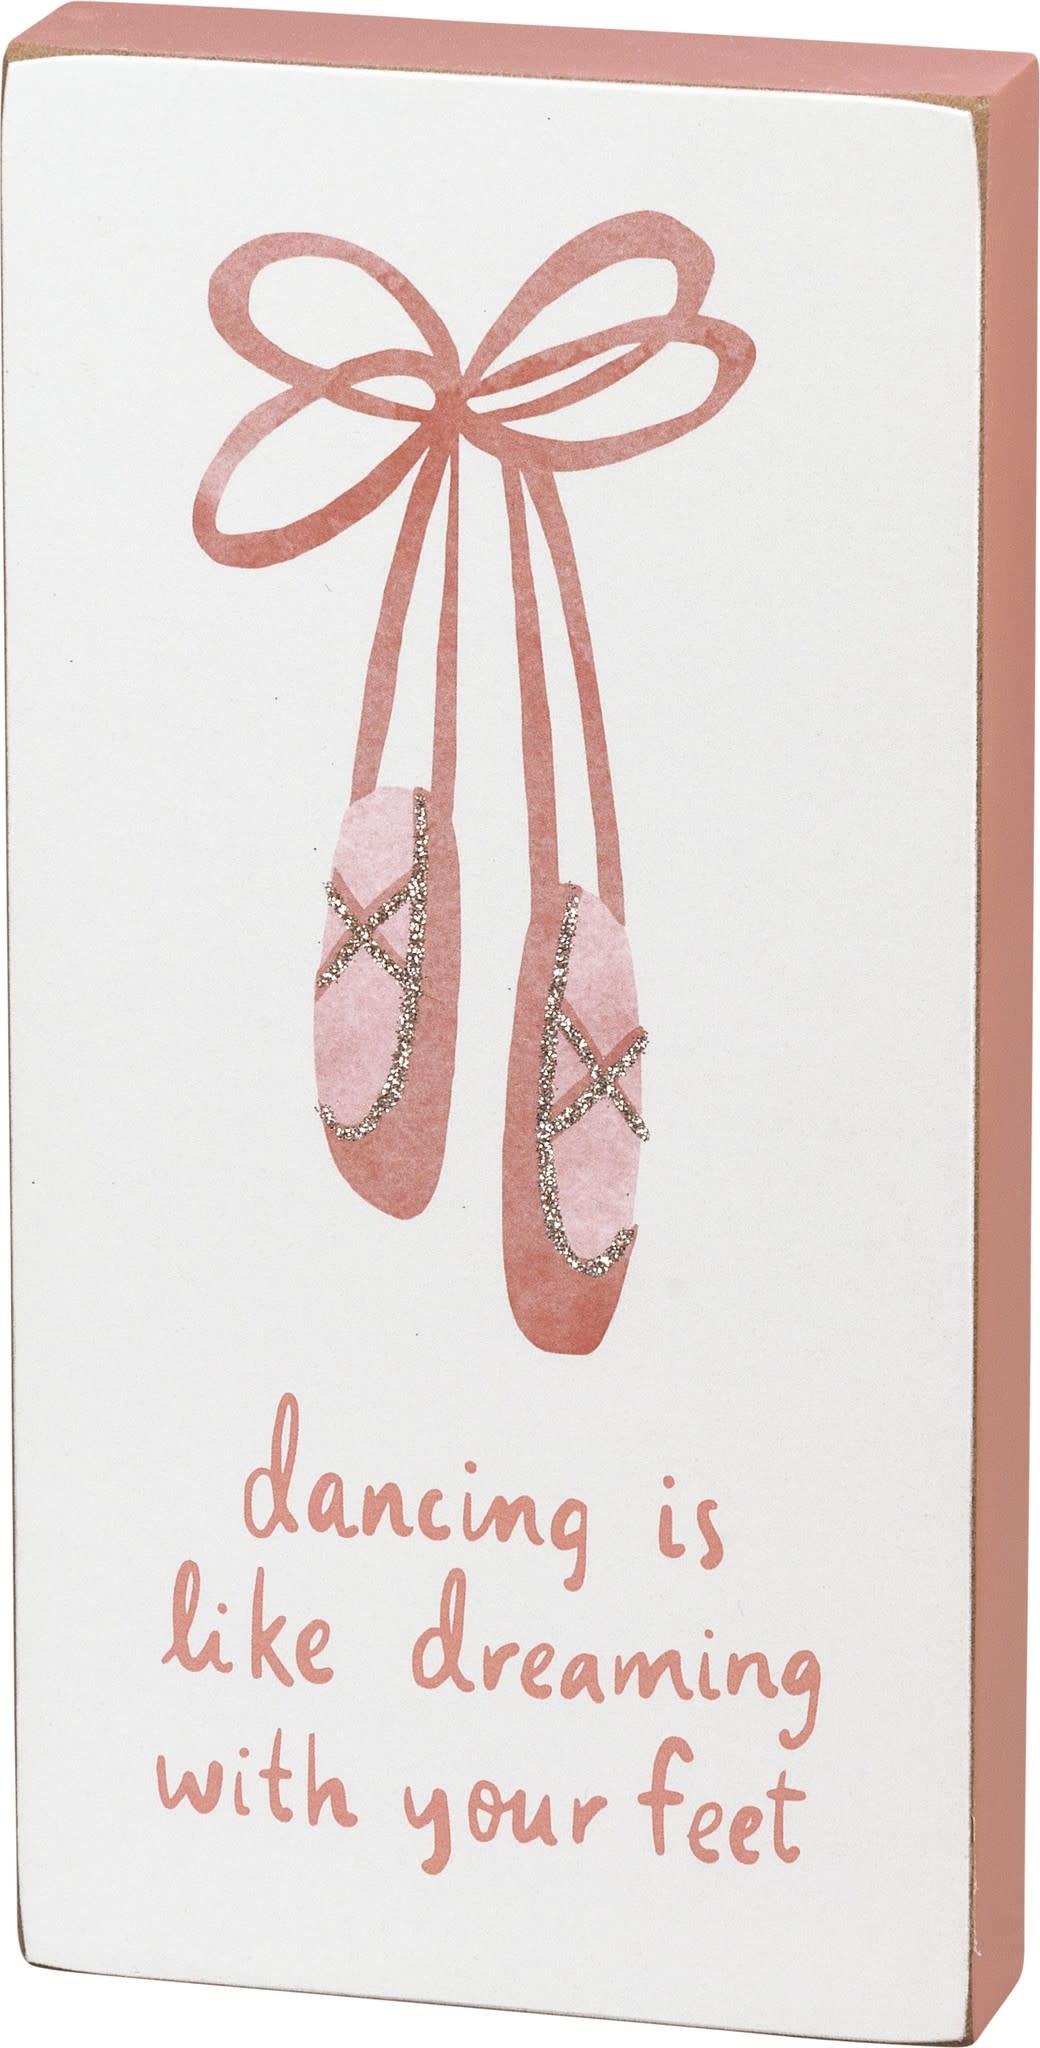 "candym Block Sign - Dancing Like Dreaming, P104404, 4"" x 8"" x 1"""